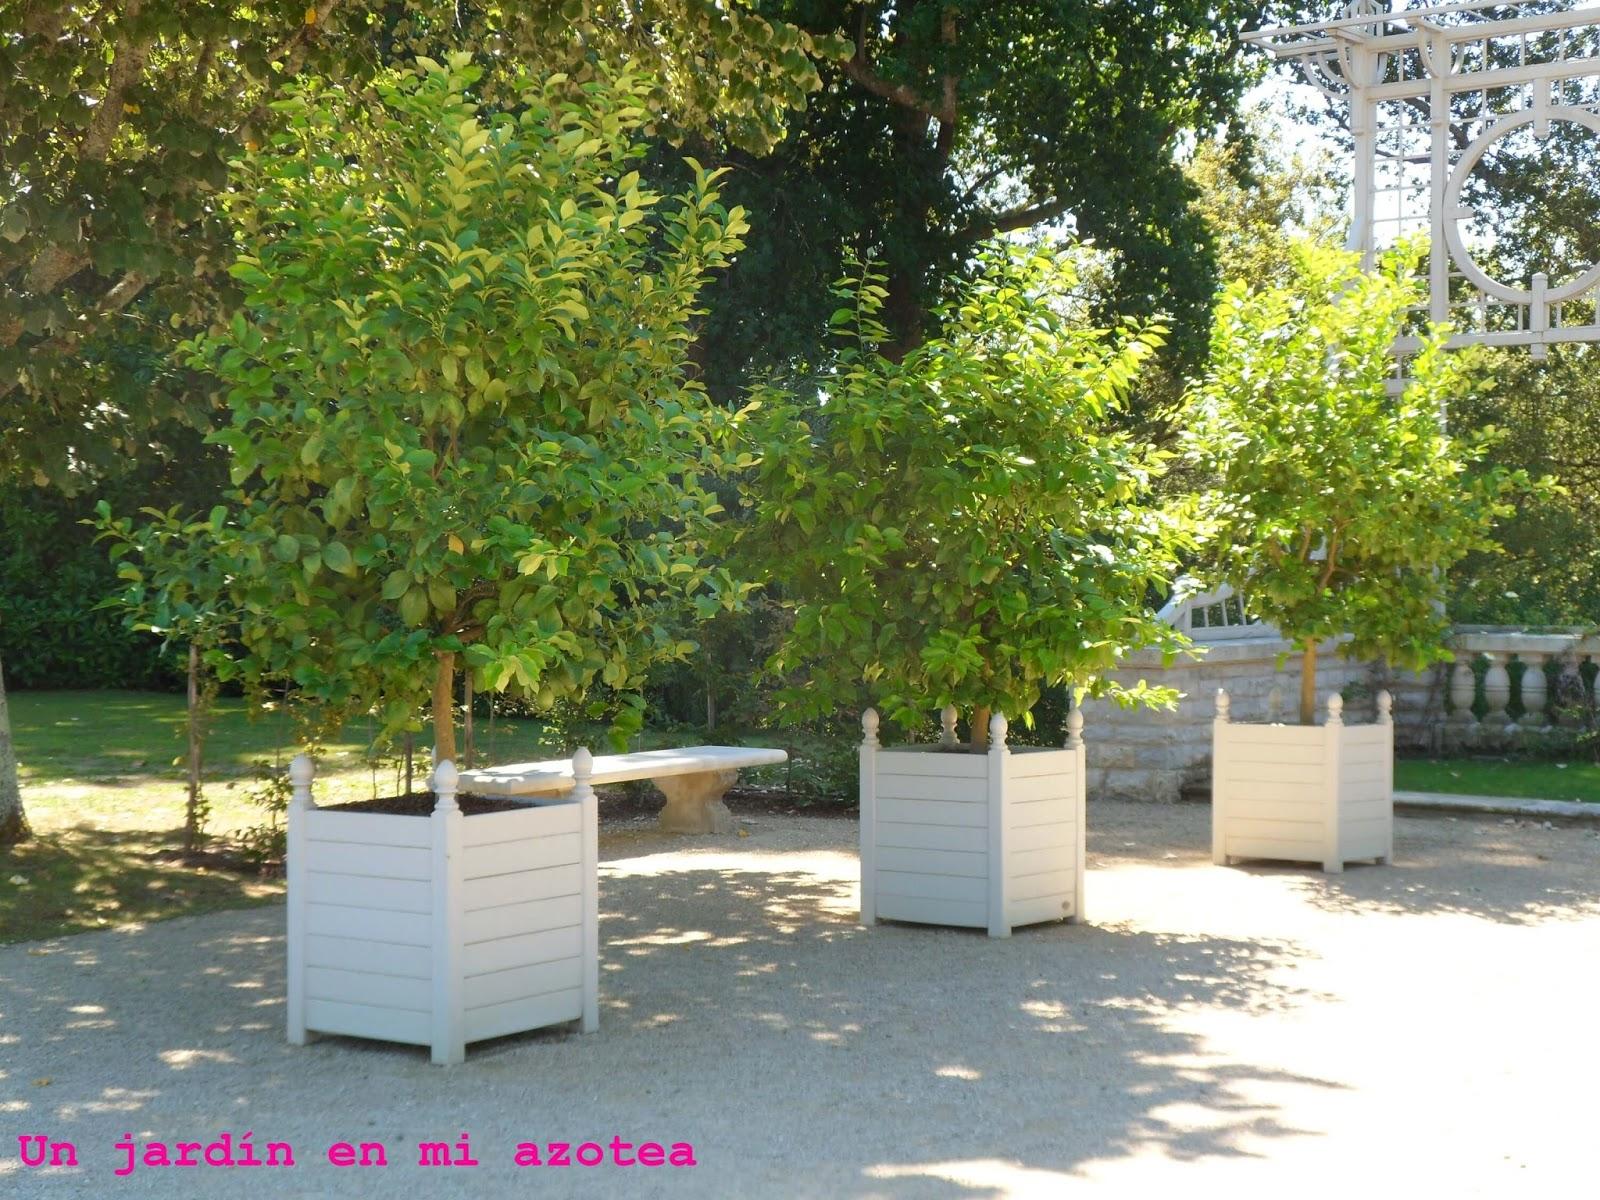 Un jardín en mi azotea: UN JARDÍN PARA EDMOND ROSTAND